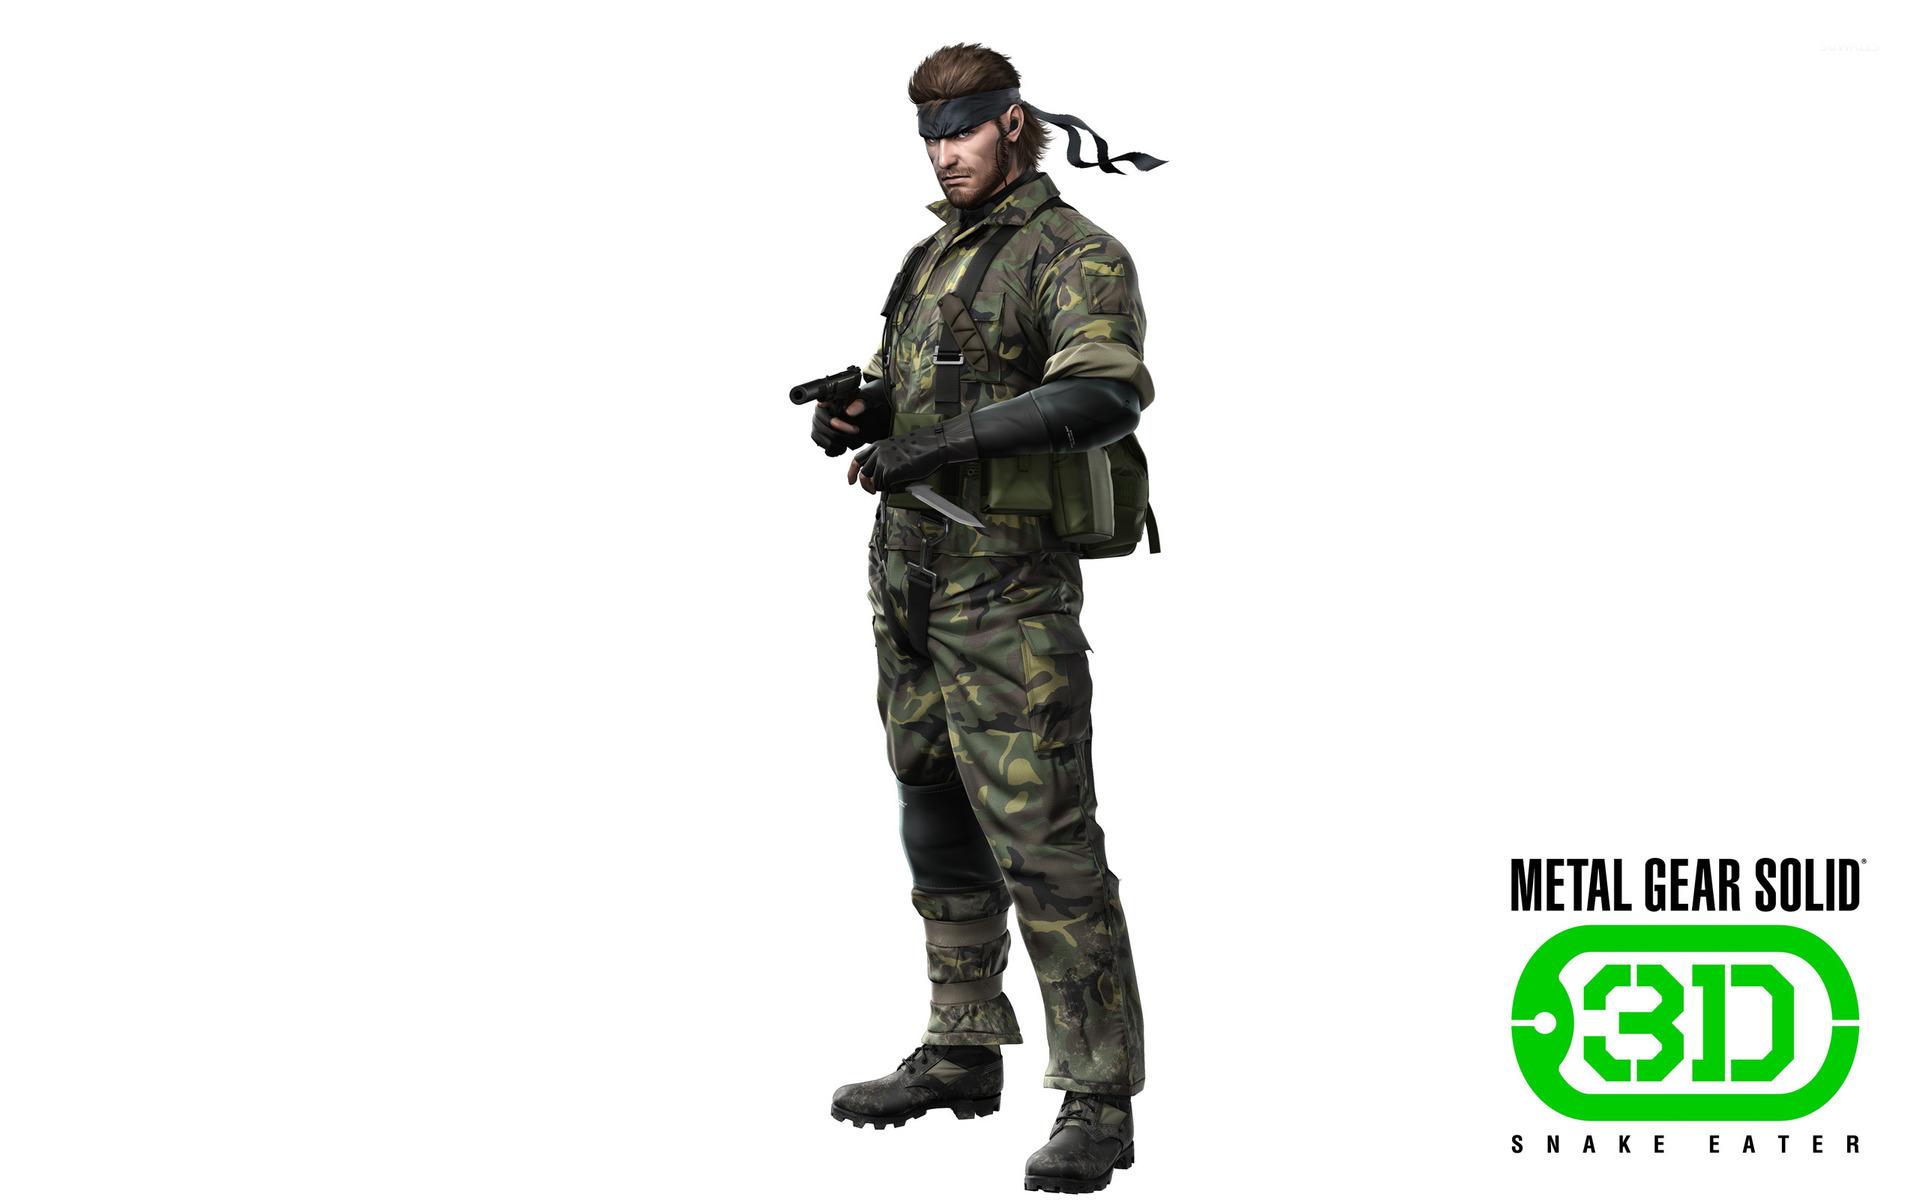 Animal Wild Wallpaper Hd 3d Metal Gear Solid Snake Eater 3d 5 Wallpaper Game